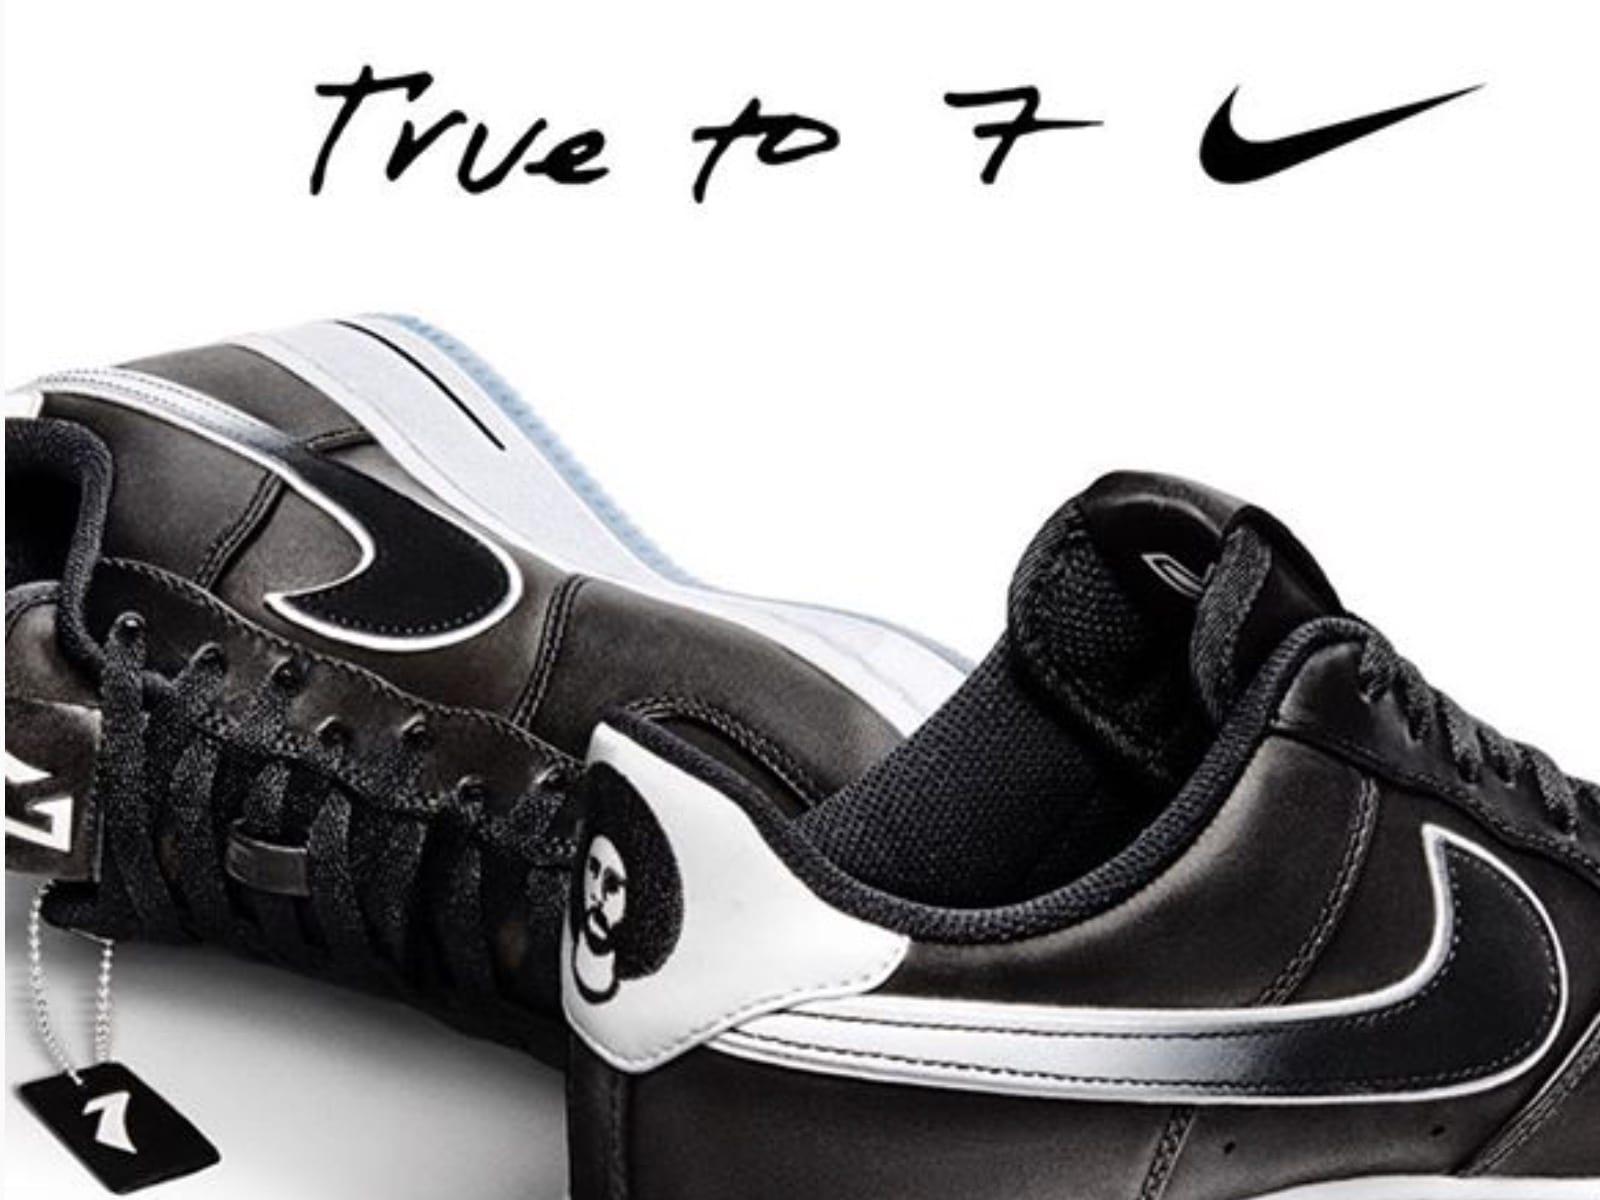 representante Crítica techo  nike air force 1 footlocker nz Shop Clothing & Shoes Online